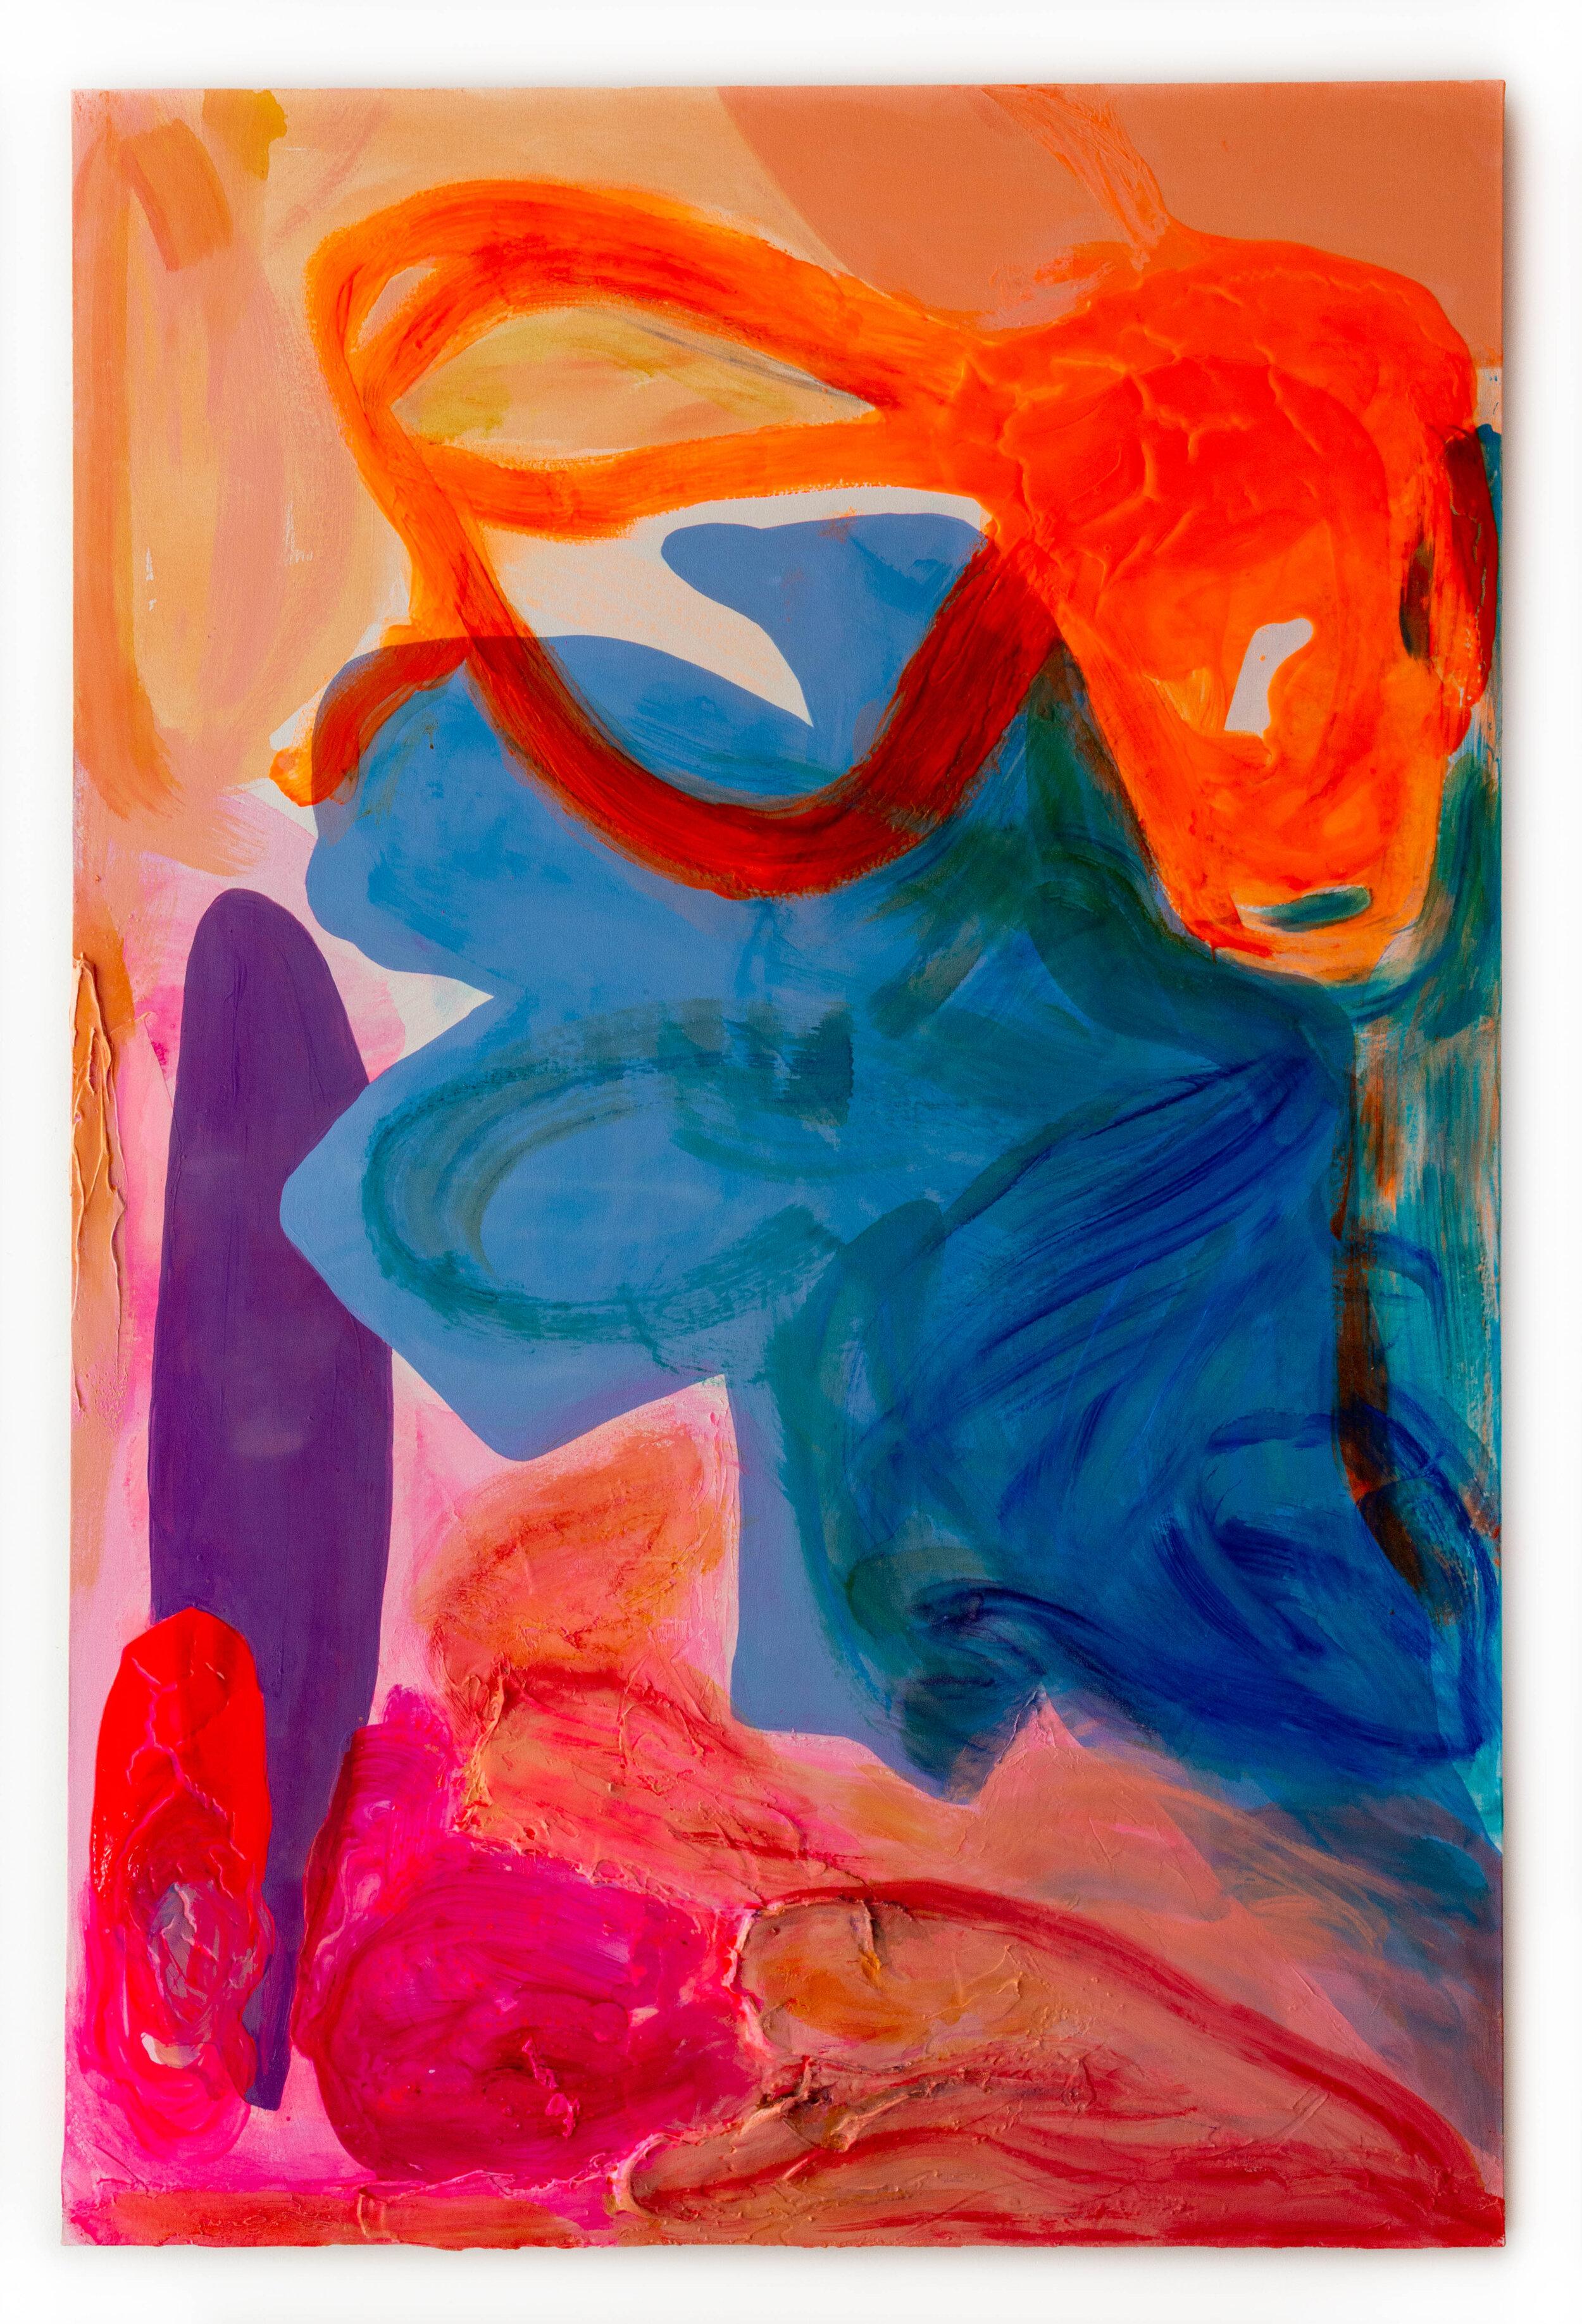 05_10_19_Debra_Drexler_9838-Edit _Orange_Wiggle.jpg